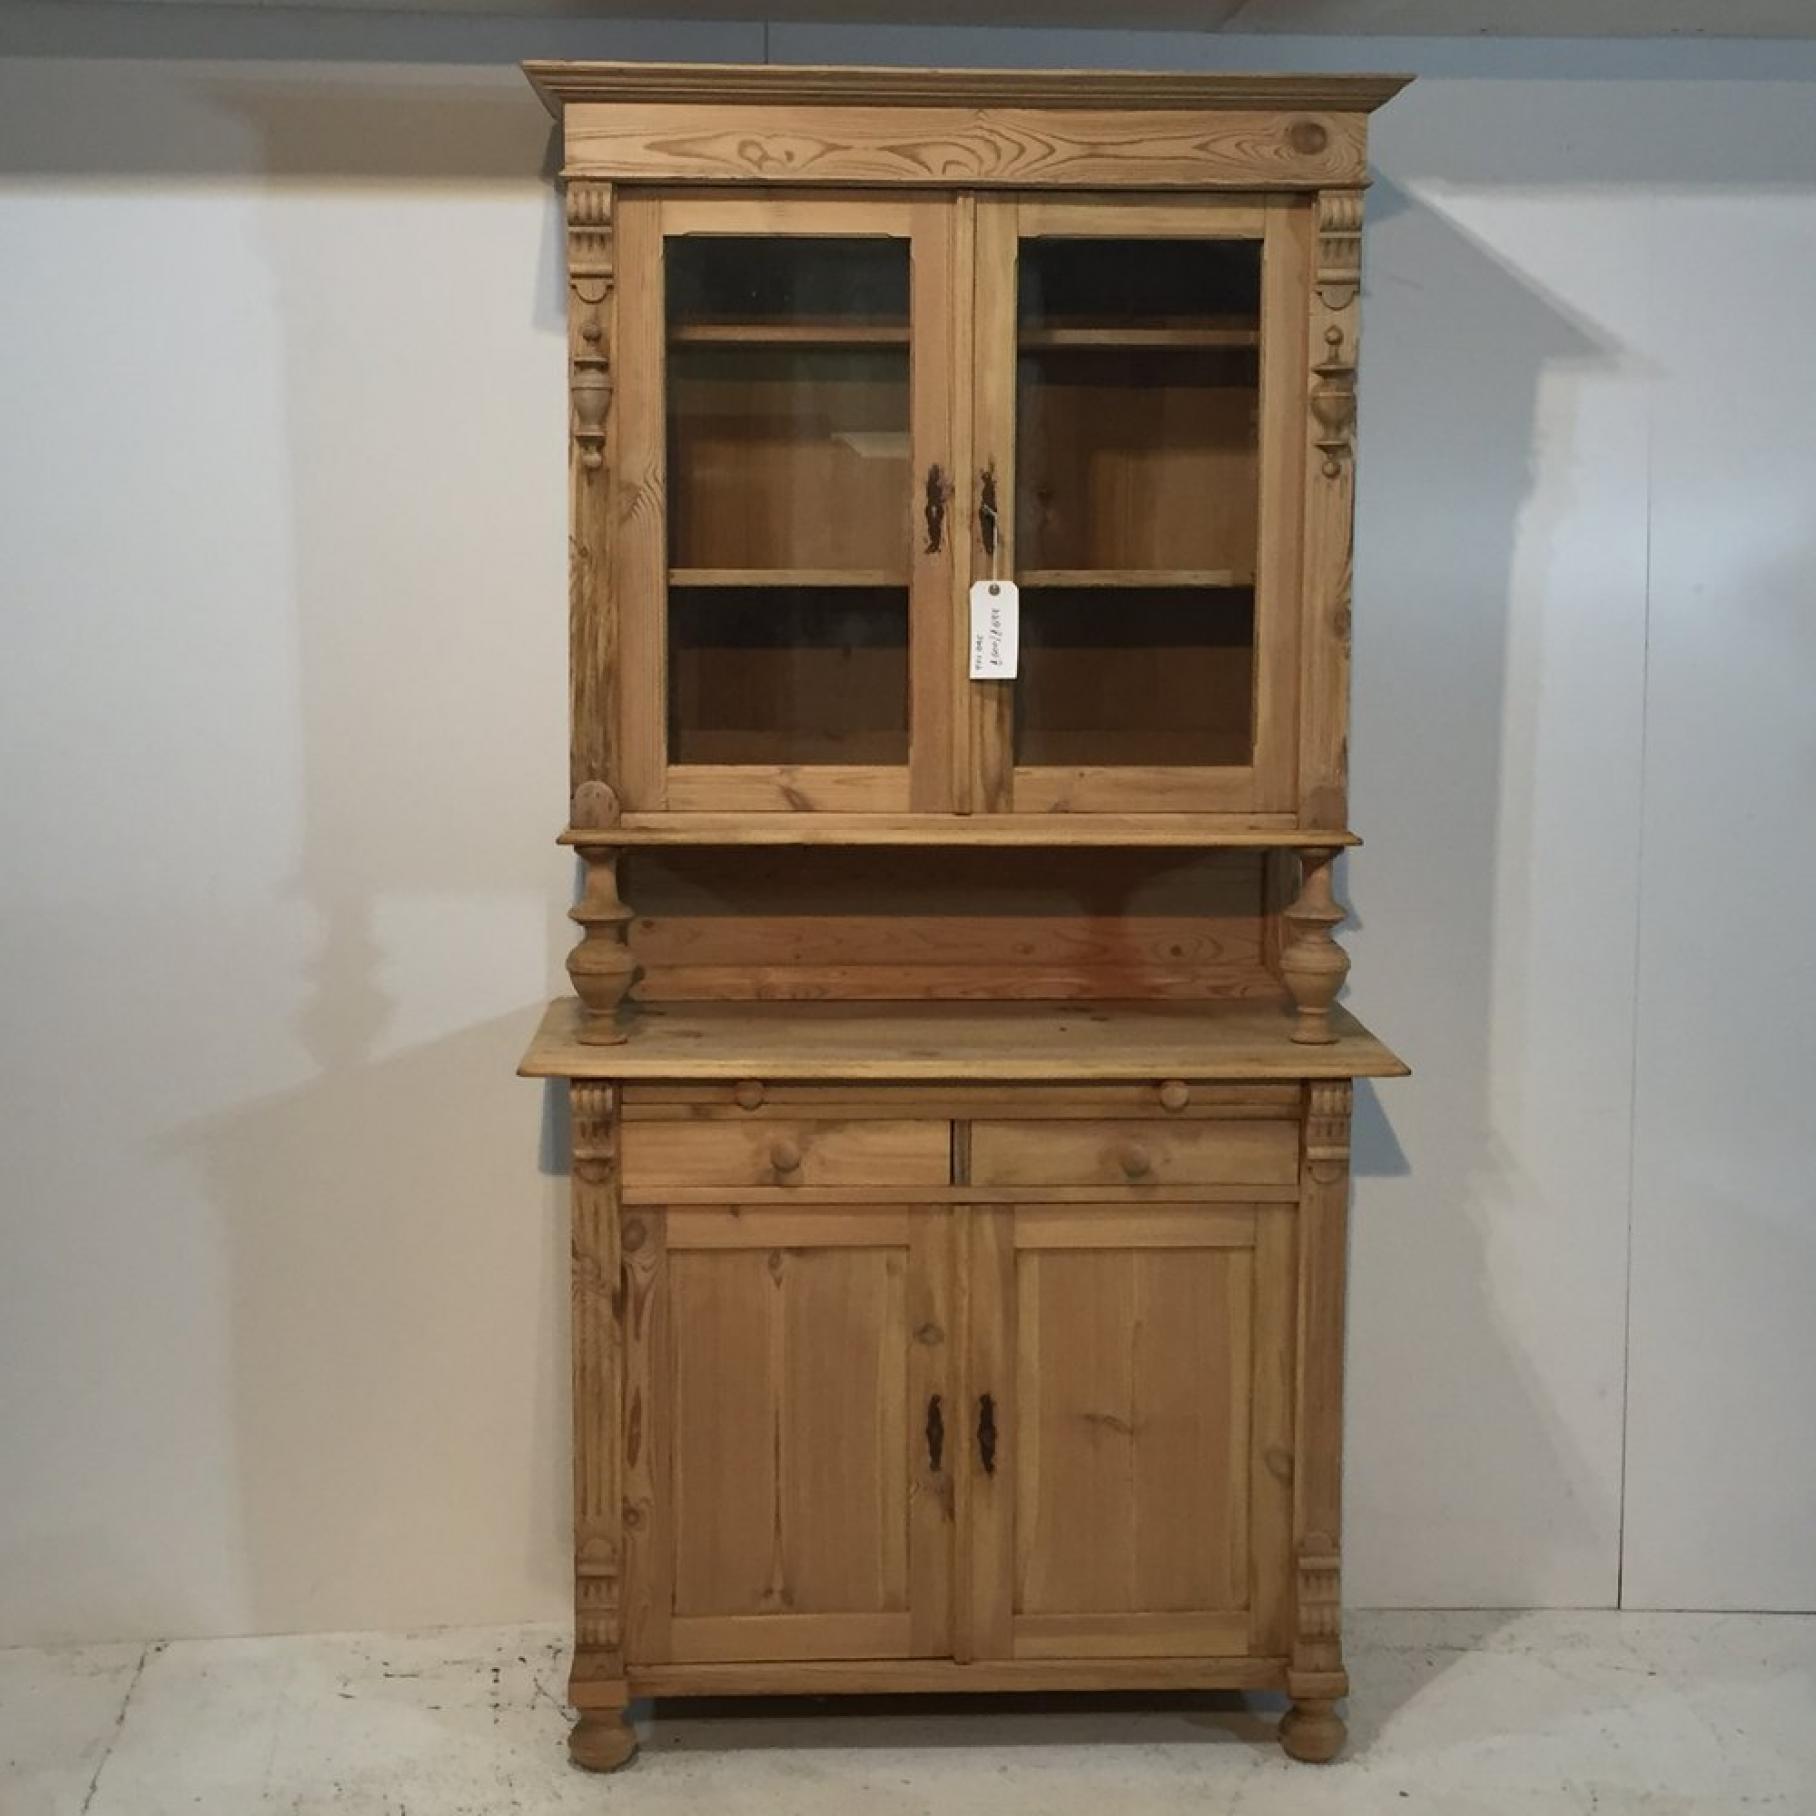 Antique Pine Glazed Farmhouse Dresser